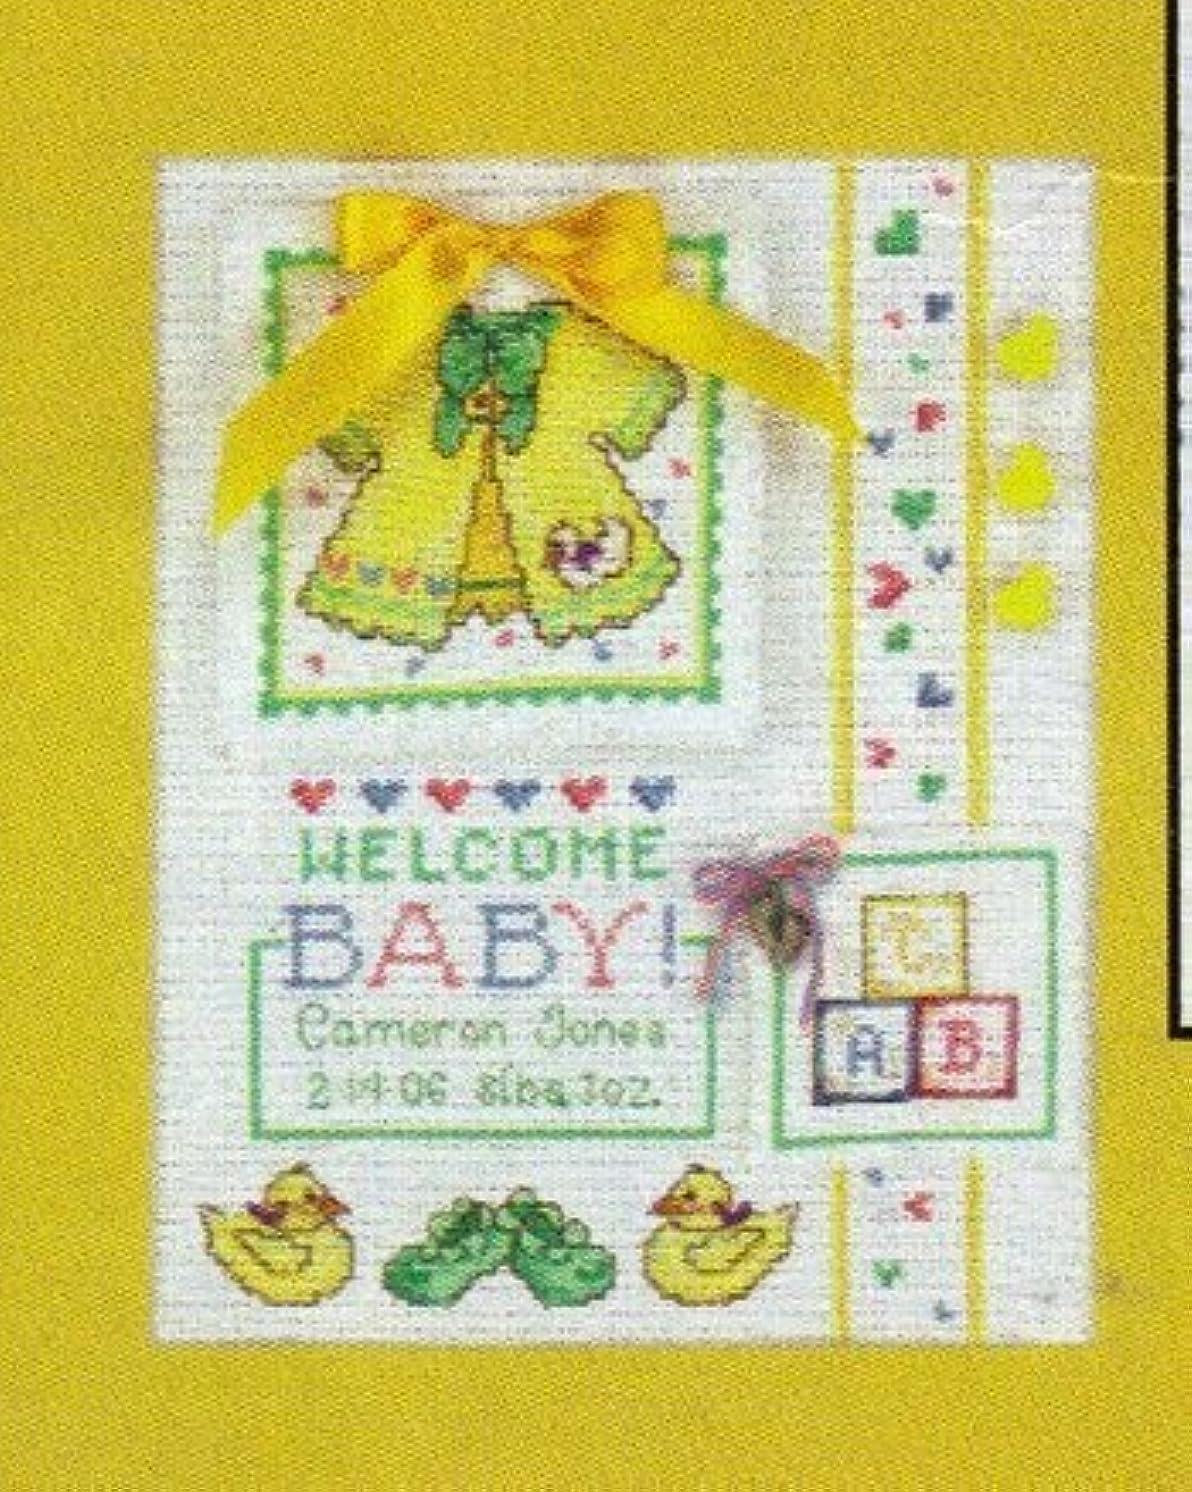 Welcome Baby - Cross Stitch Kit